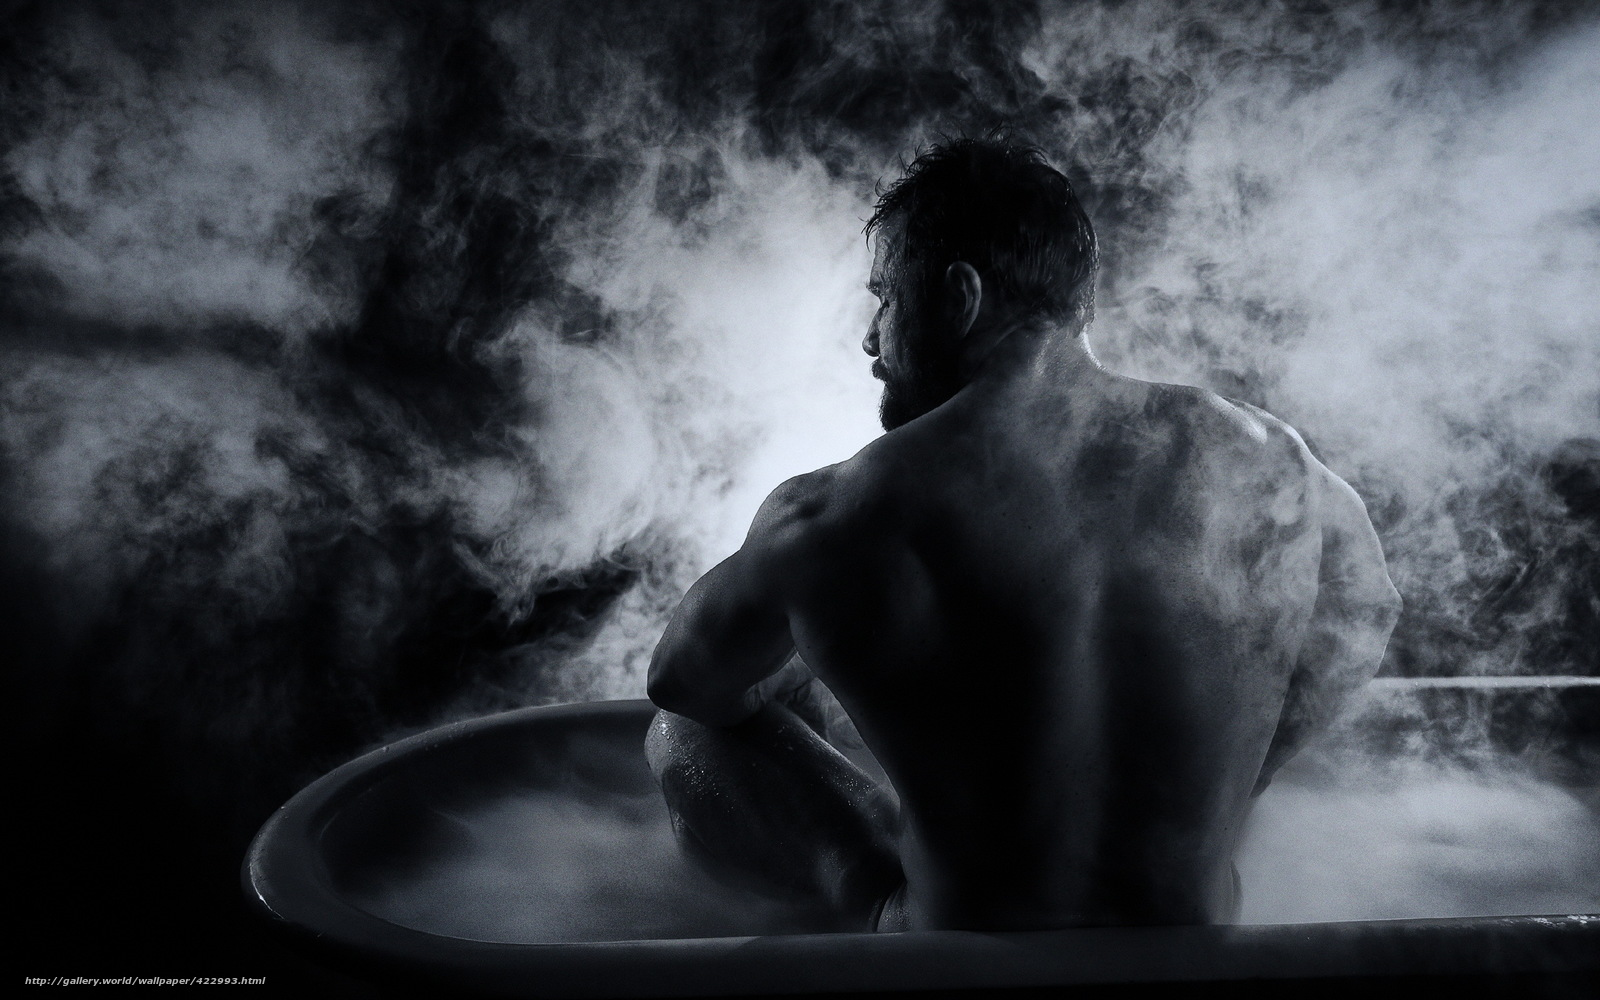 Uomo In Vasca Da Bagno.Scaricare Gli Sfondi Uomo Vasca Da Bagno Sfondo Sfondi Gratis Per